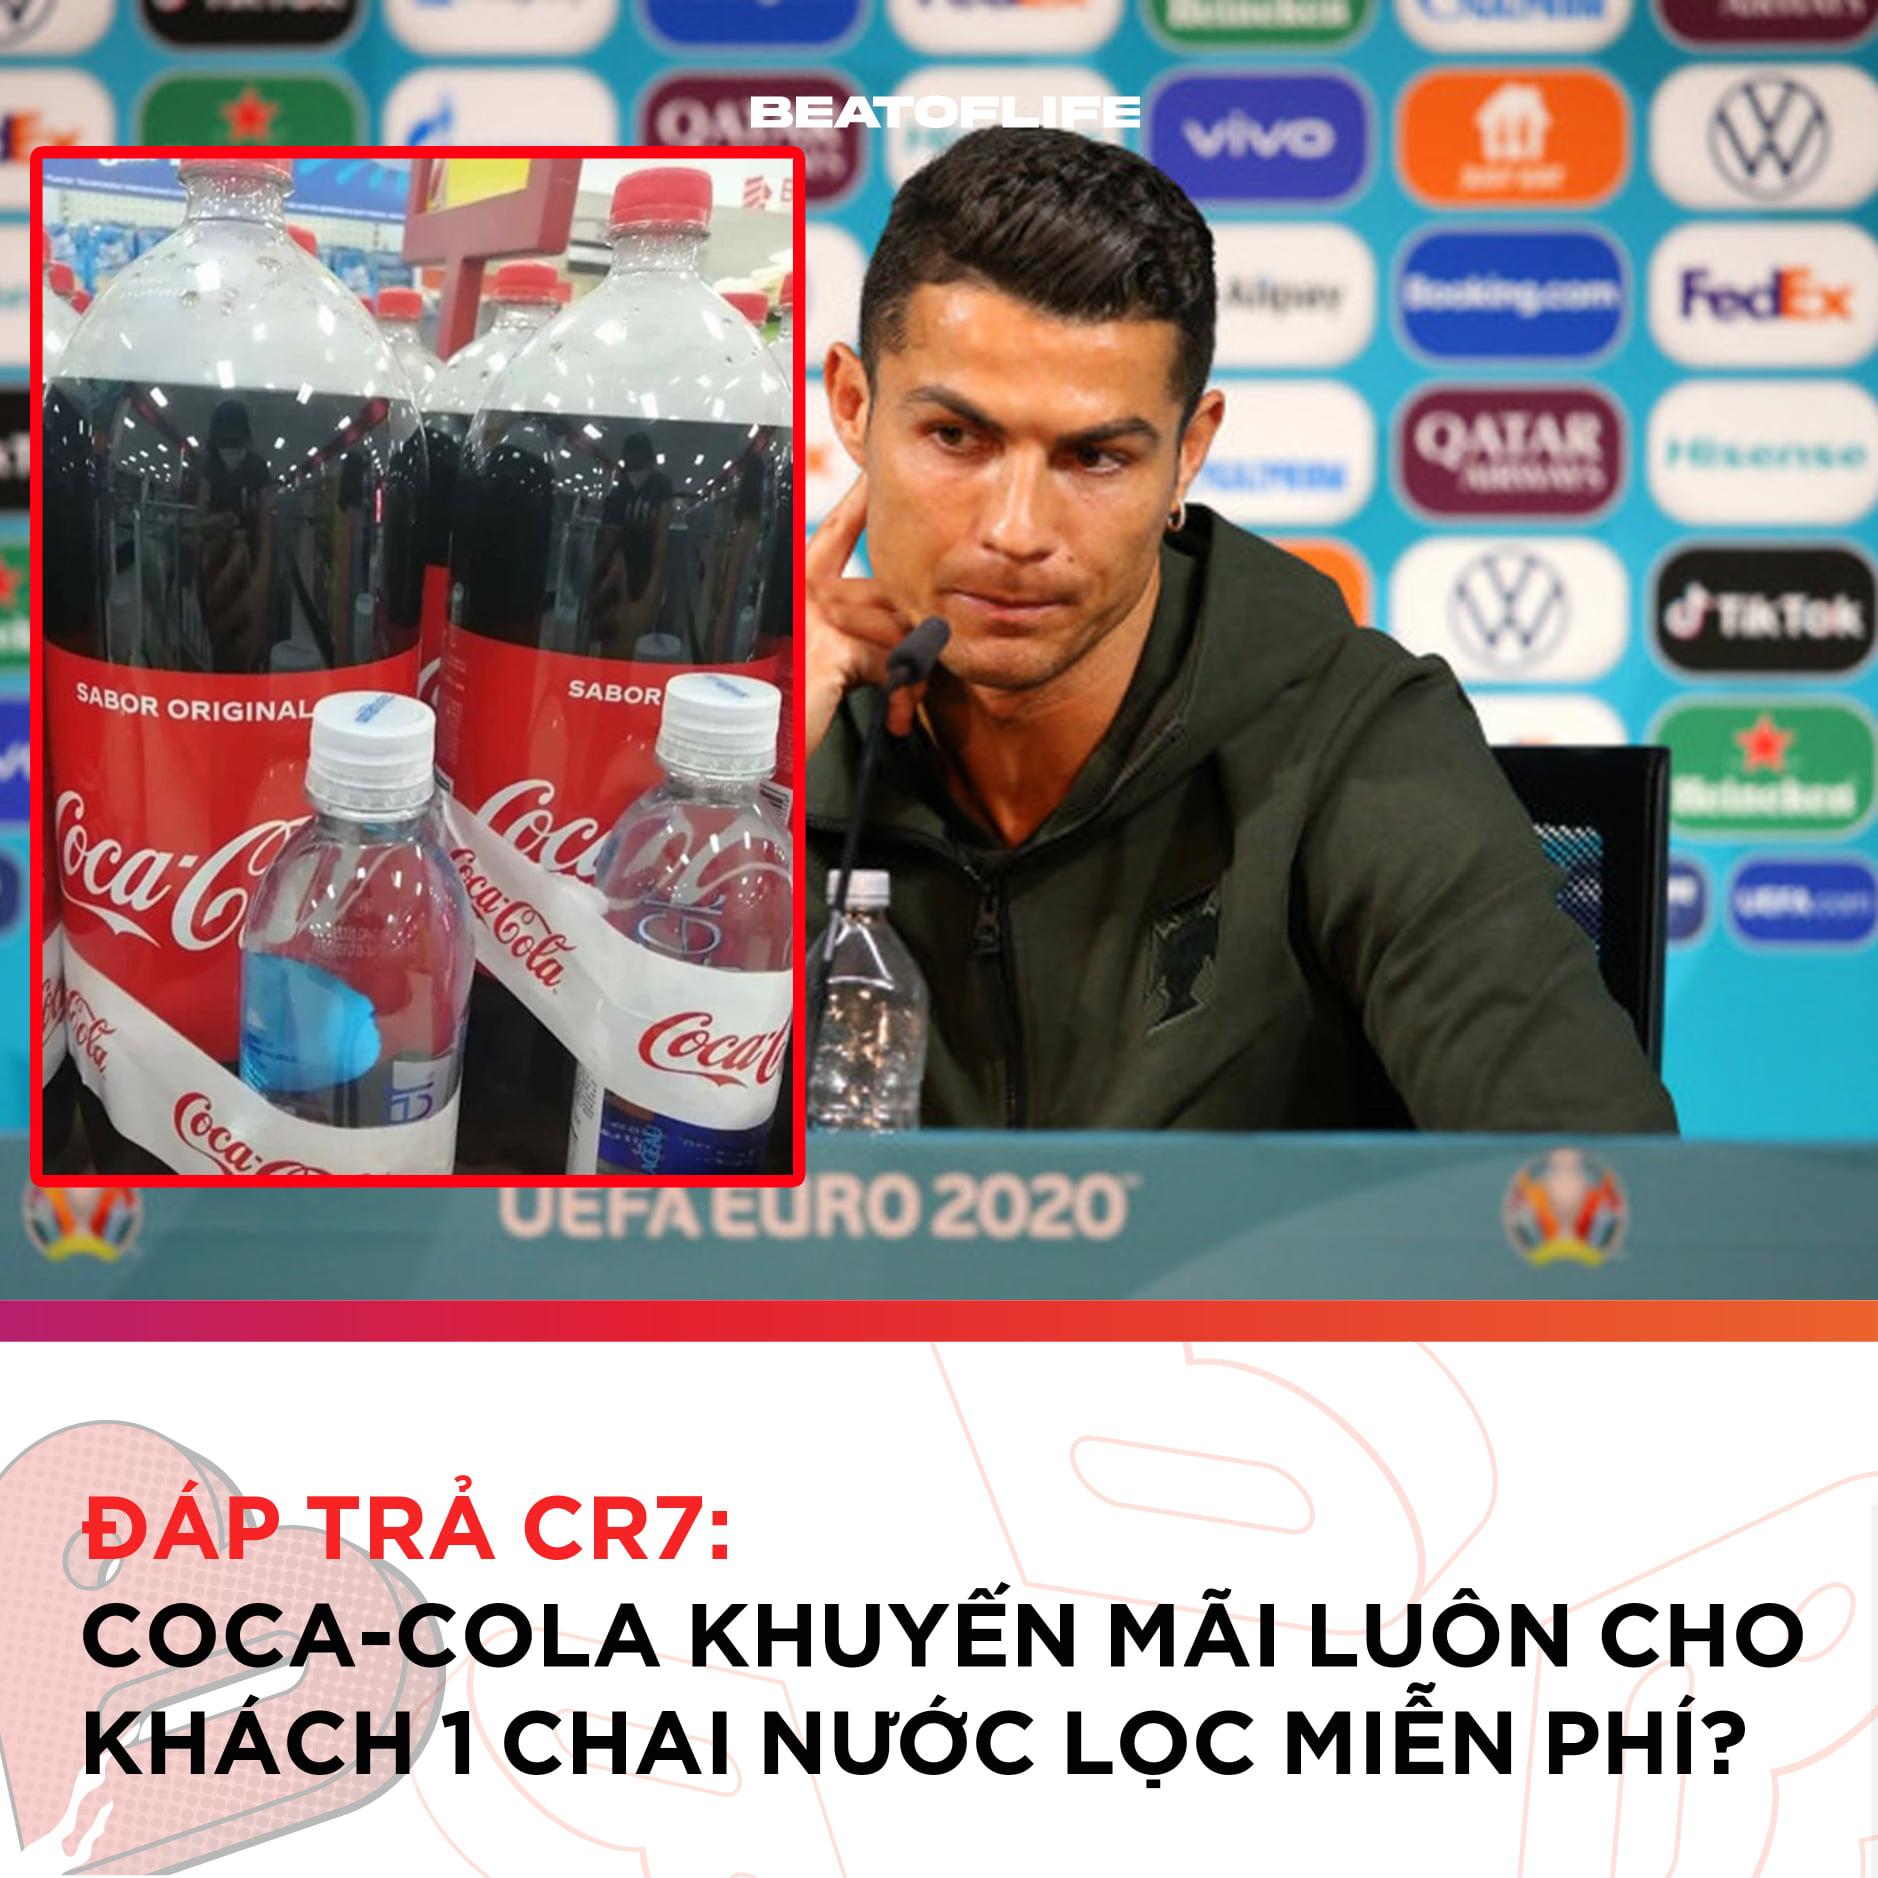 Coca to be continued: Tặng kèm chai nước lọc sau vụ Ronaldo - 1